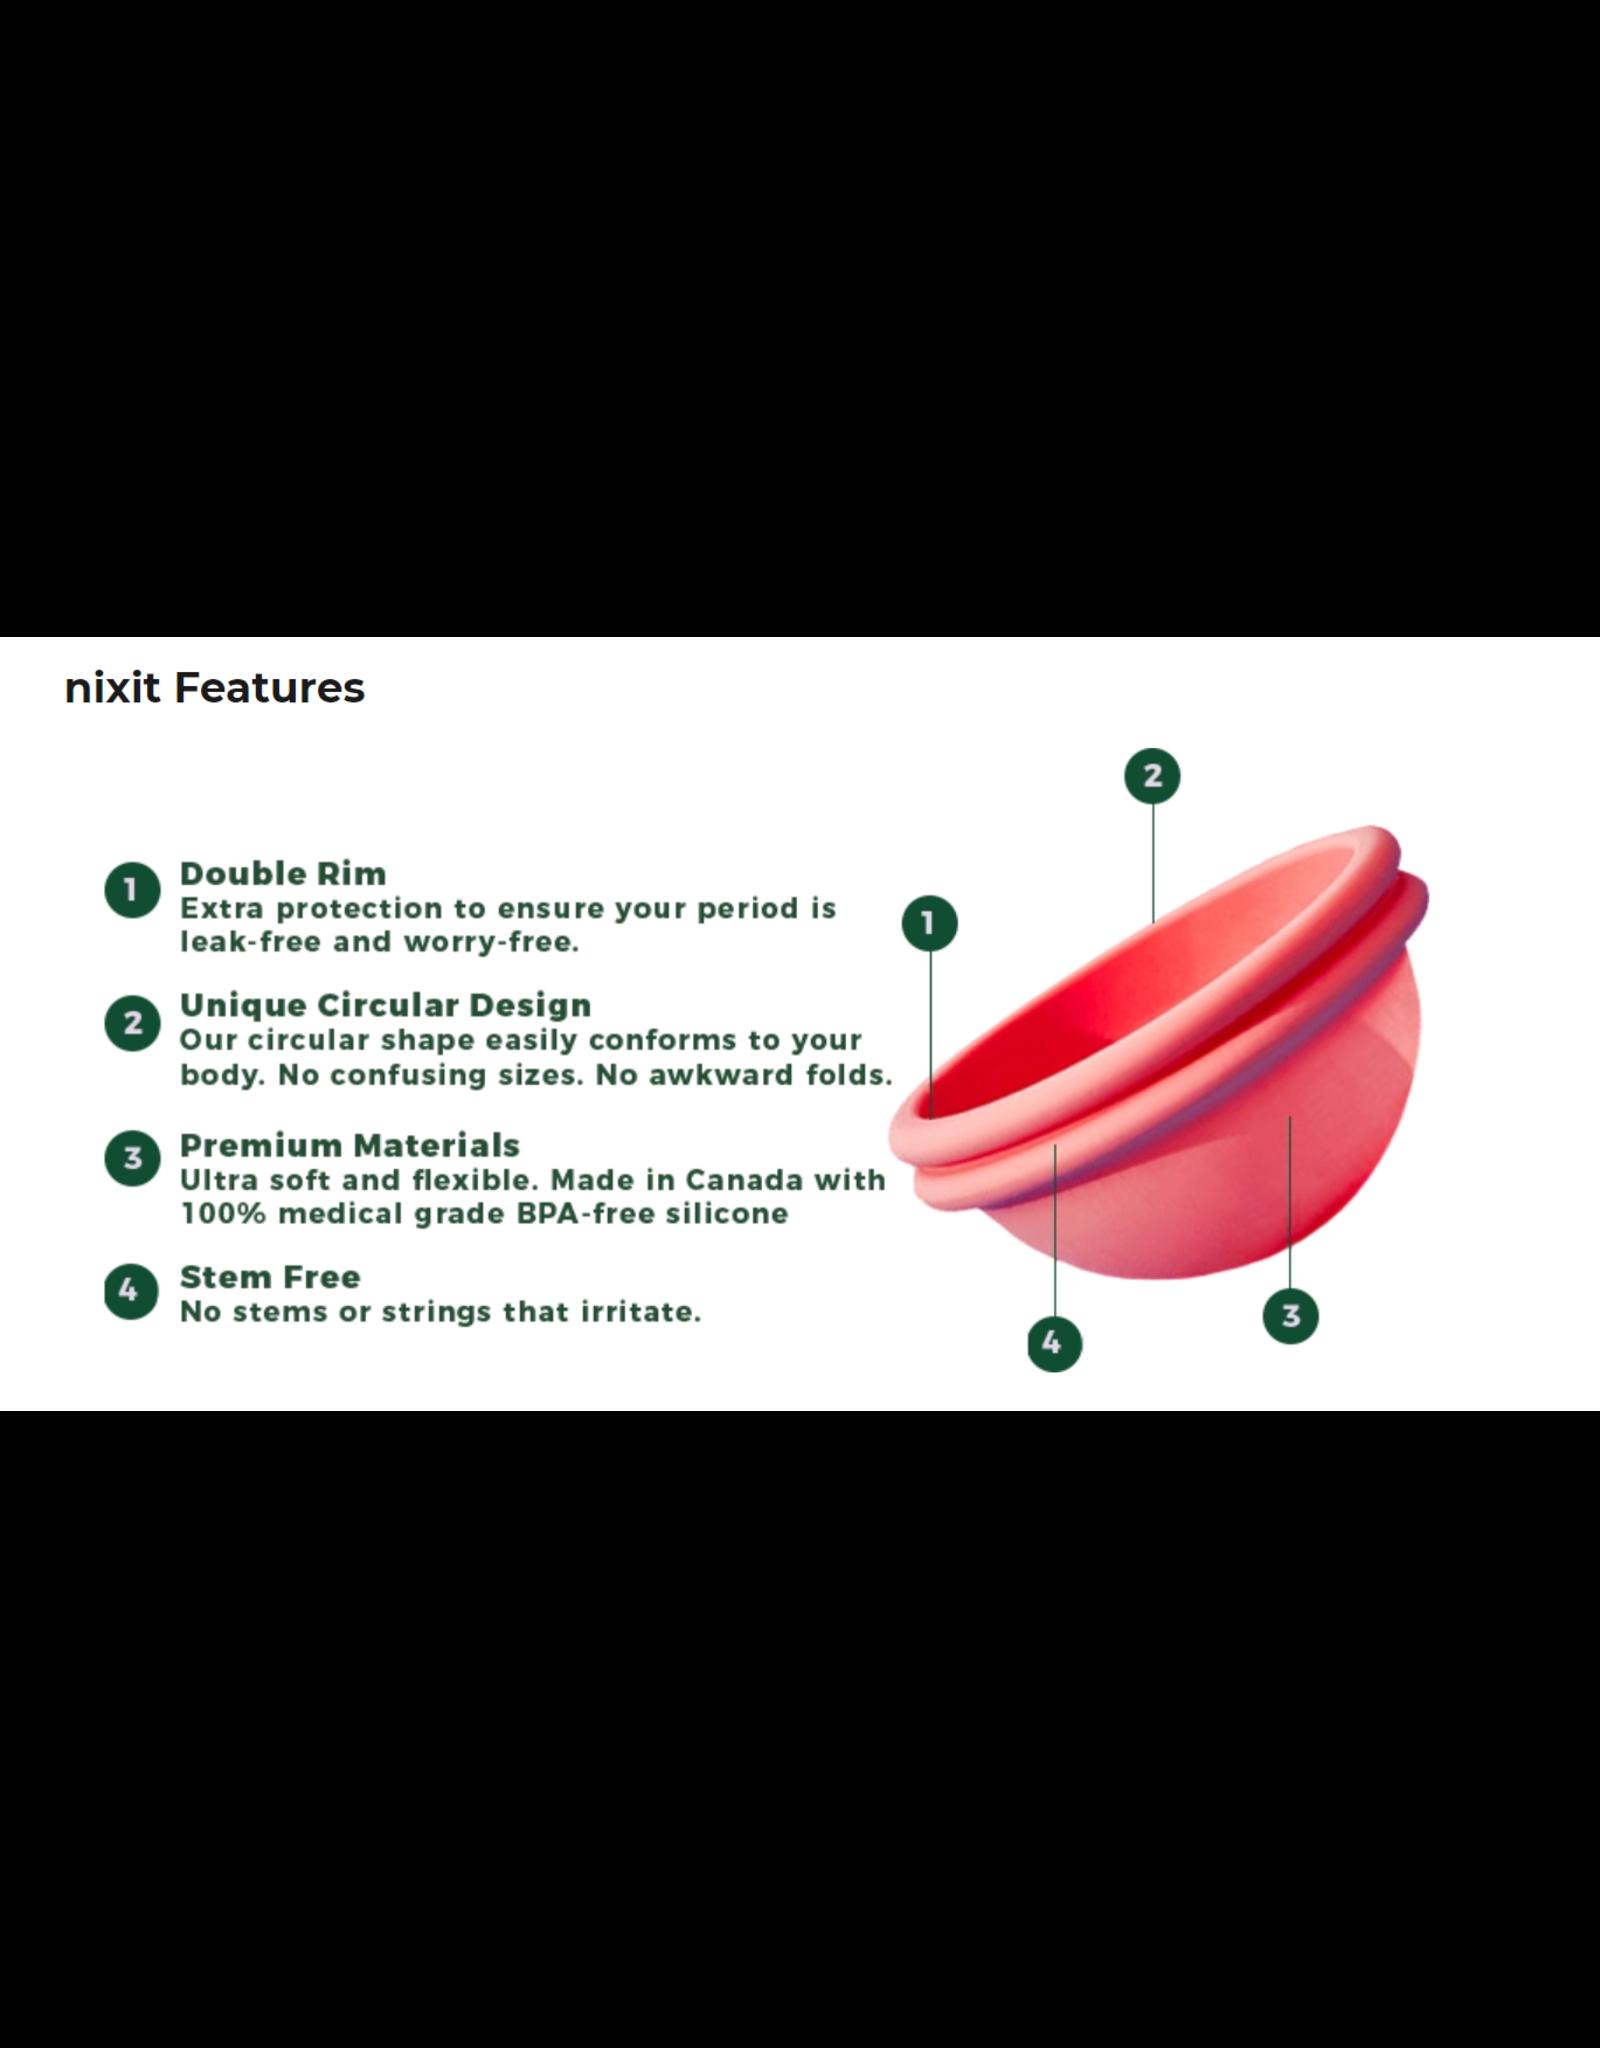 Nixit Menstrual Cup by Nixit